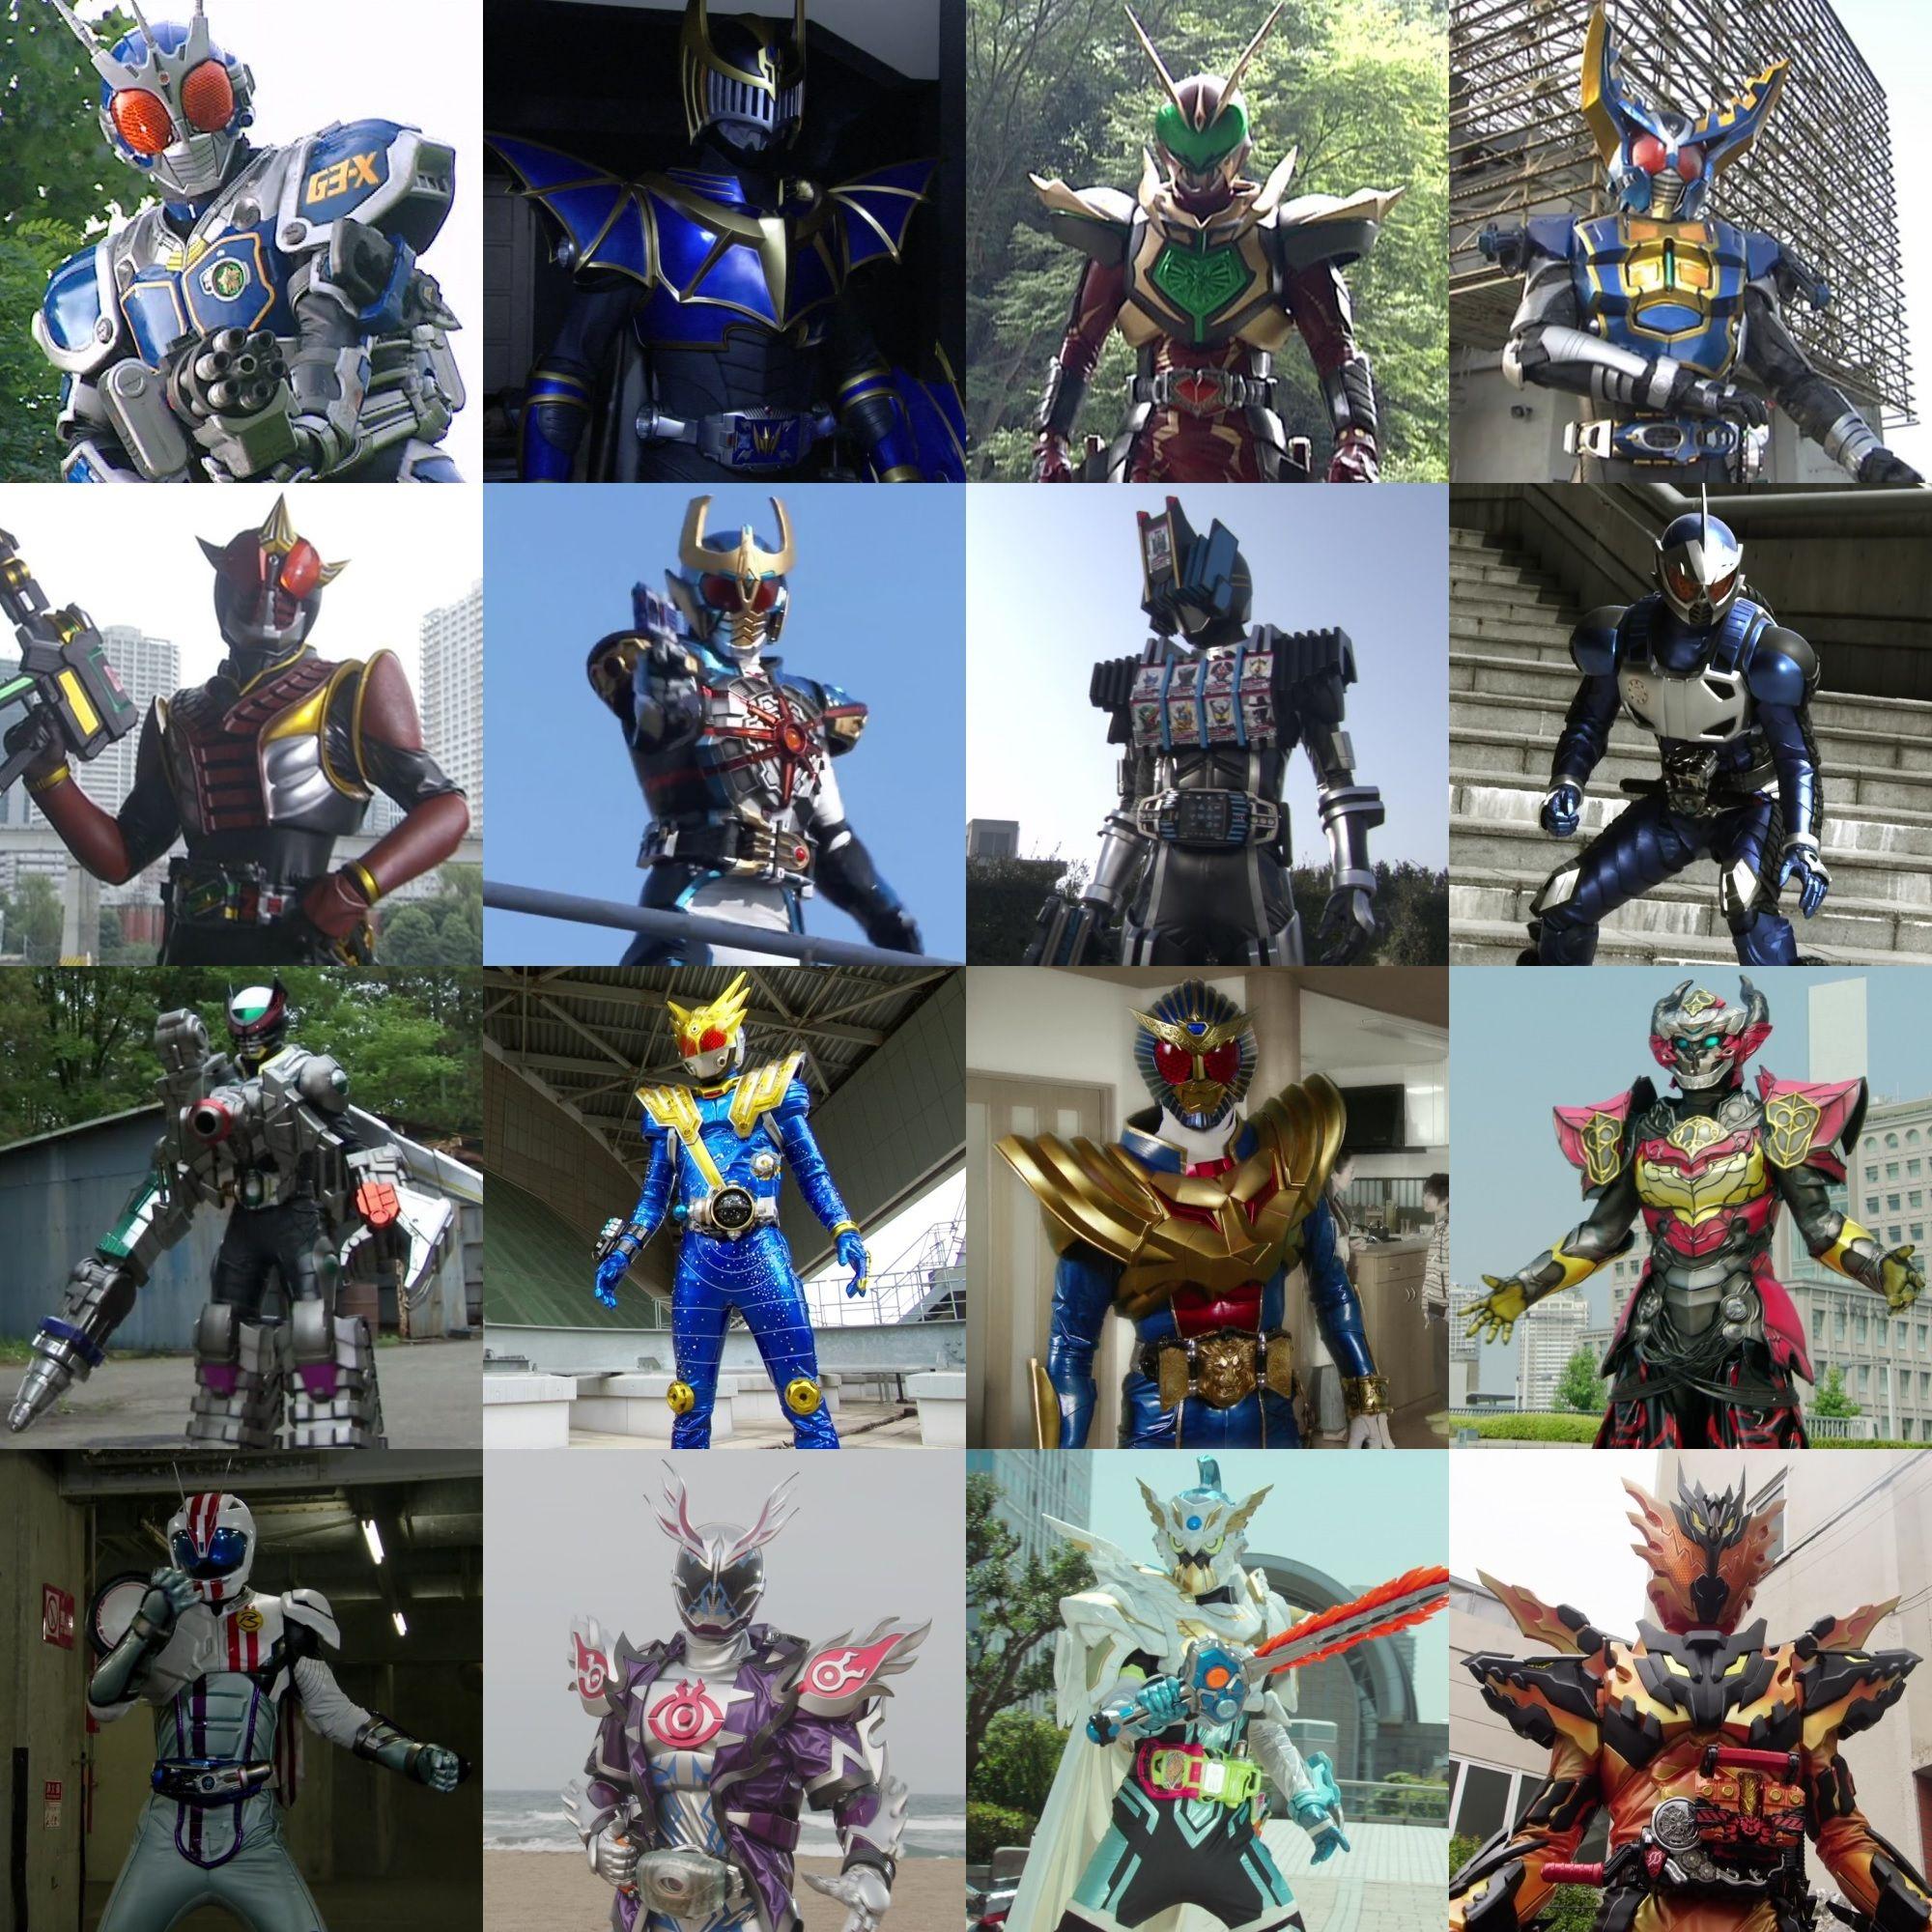 Kamen Rider Image By Pat Mayer On Kamen Rider Accel Trial Form Rider Kamen Rider Series